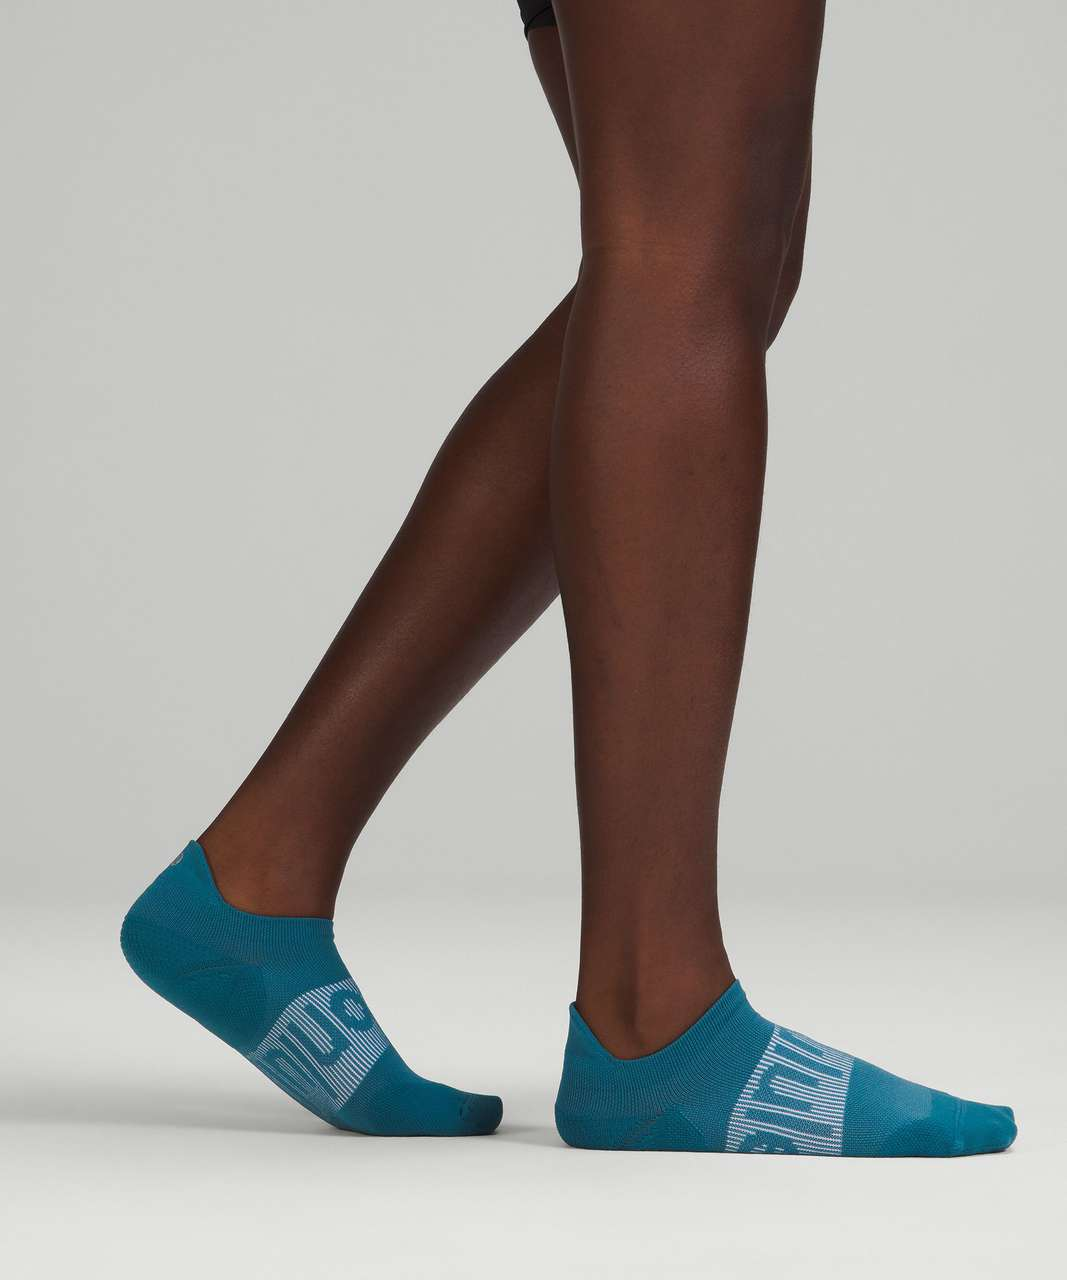 Lululemon Power Stride Tab Sock - Capture Blue